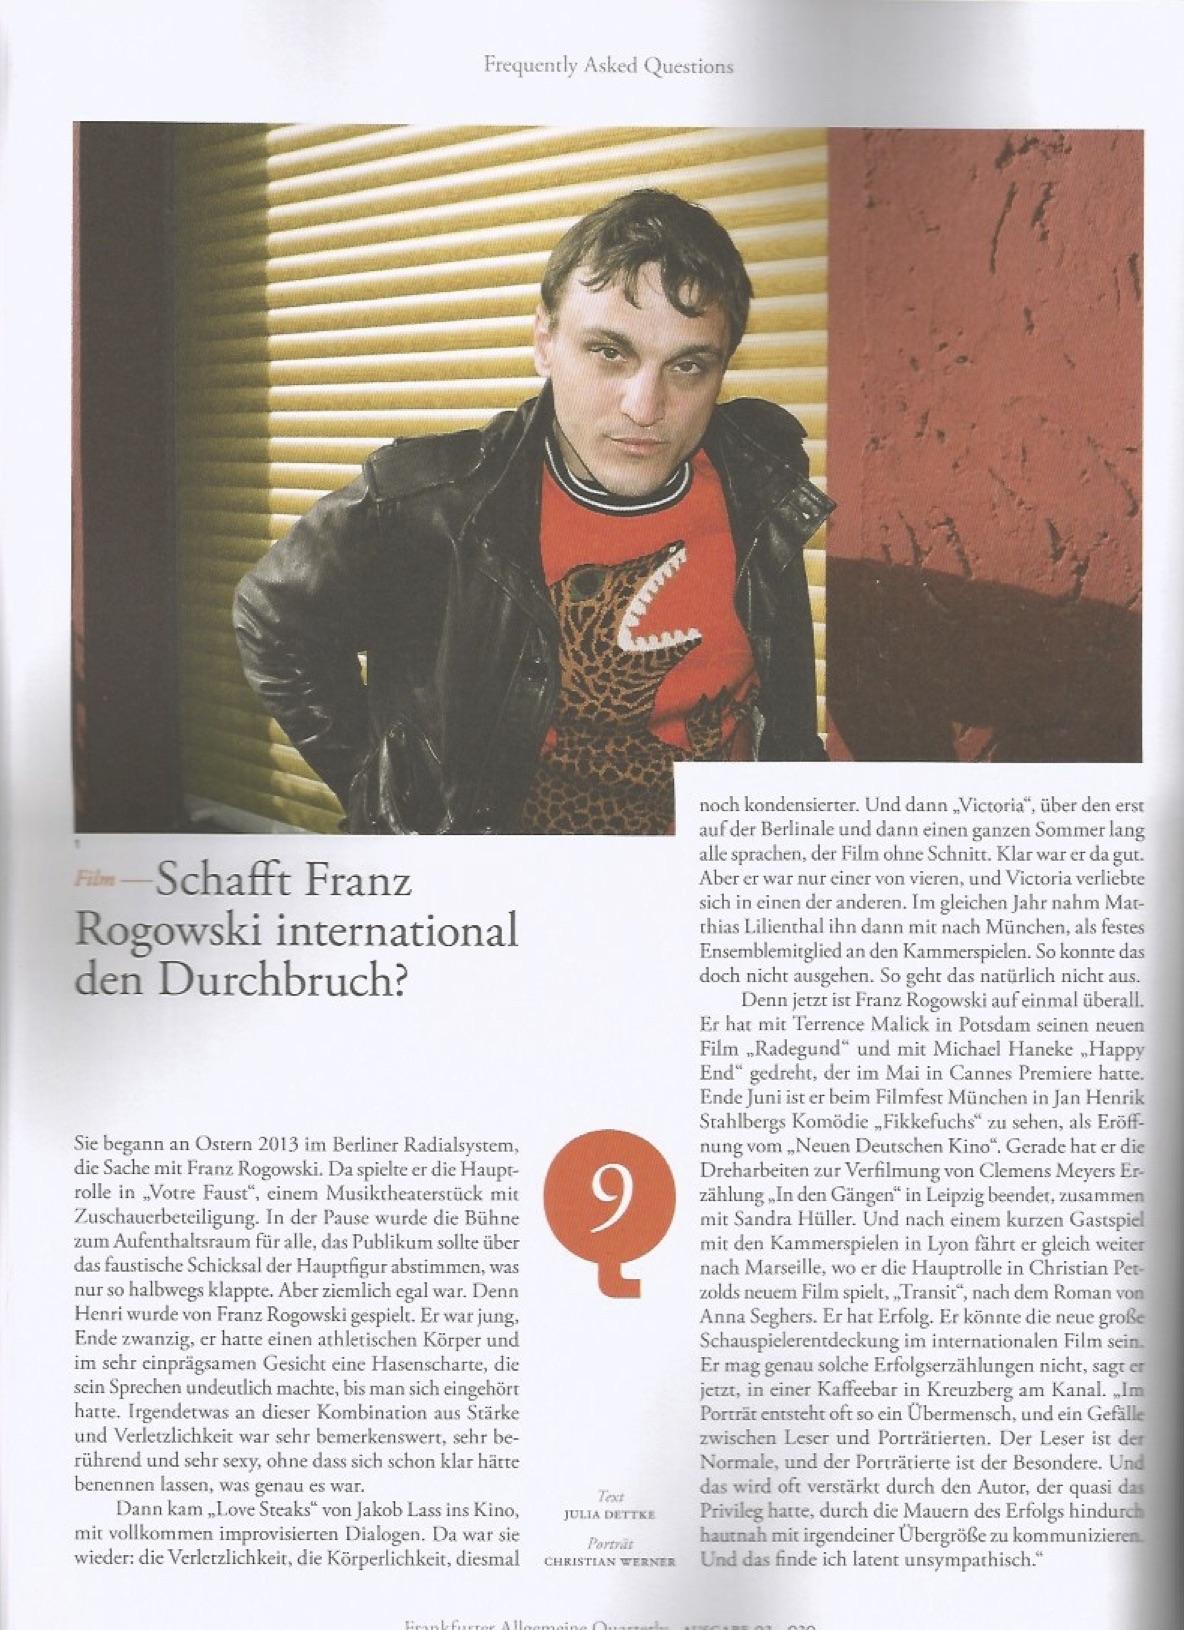 Franz Rogowski @ FAZ Quarterly